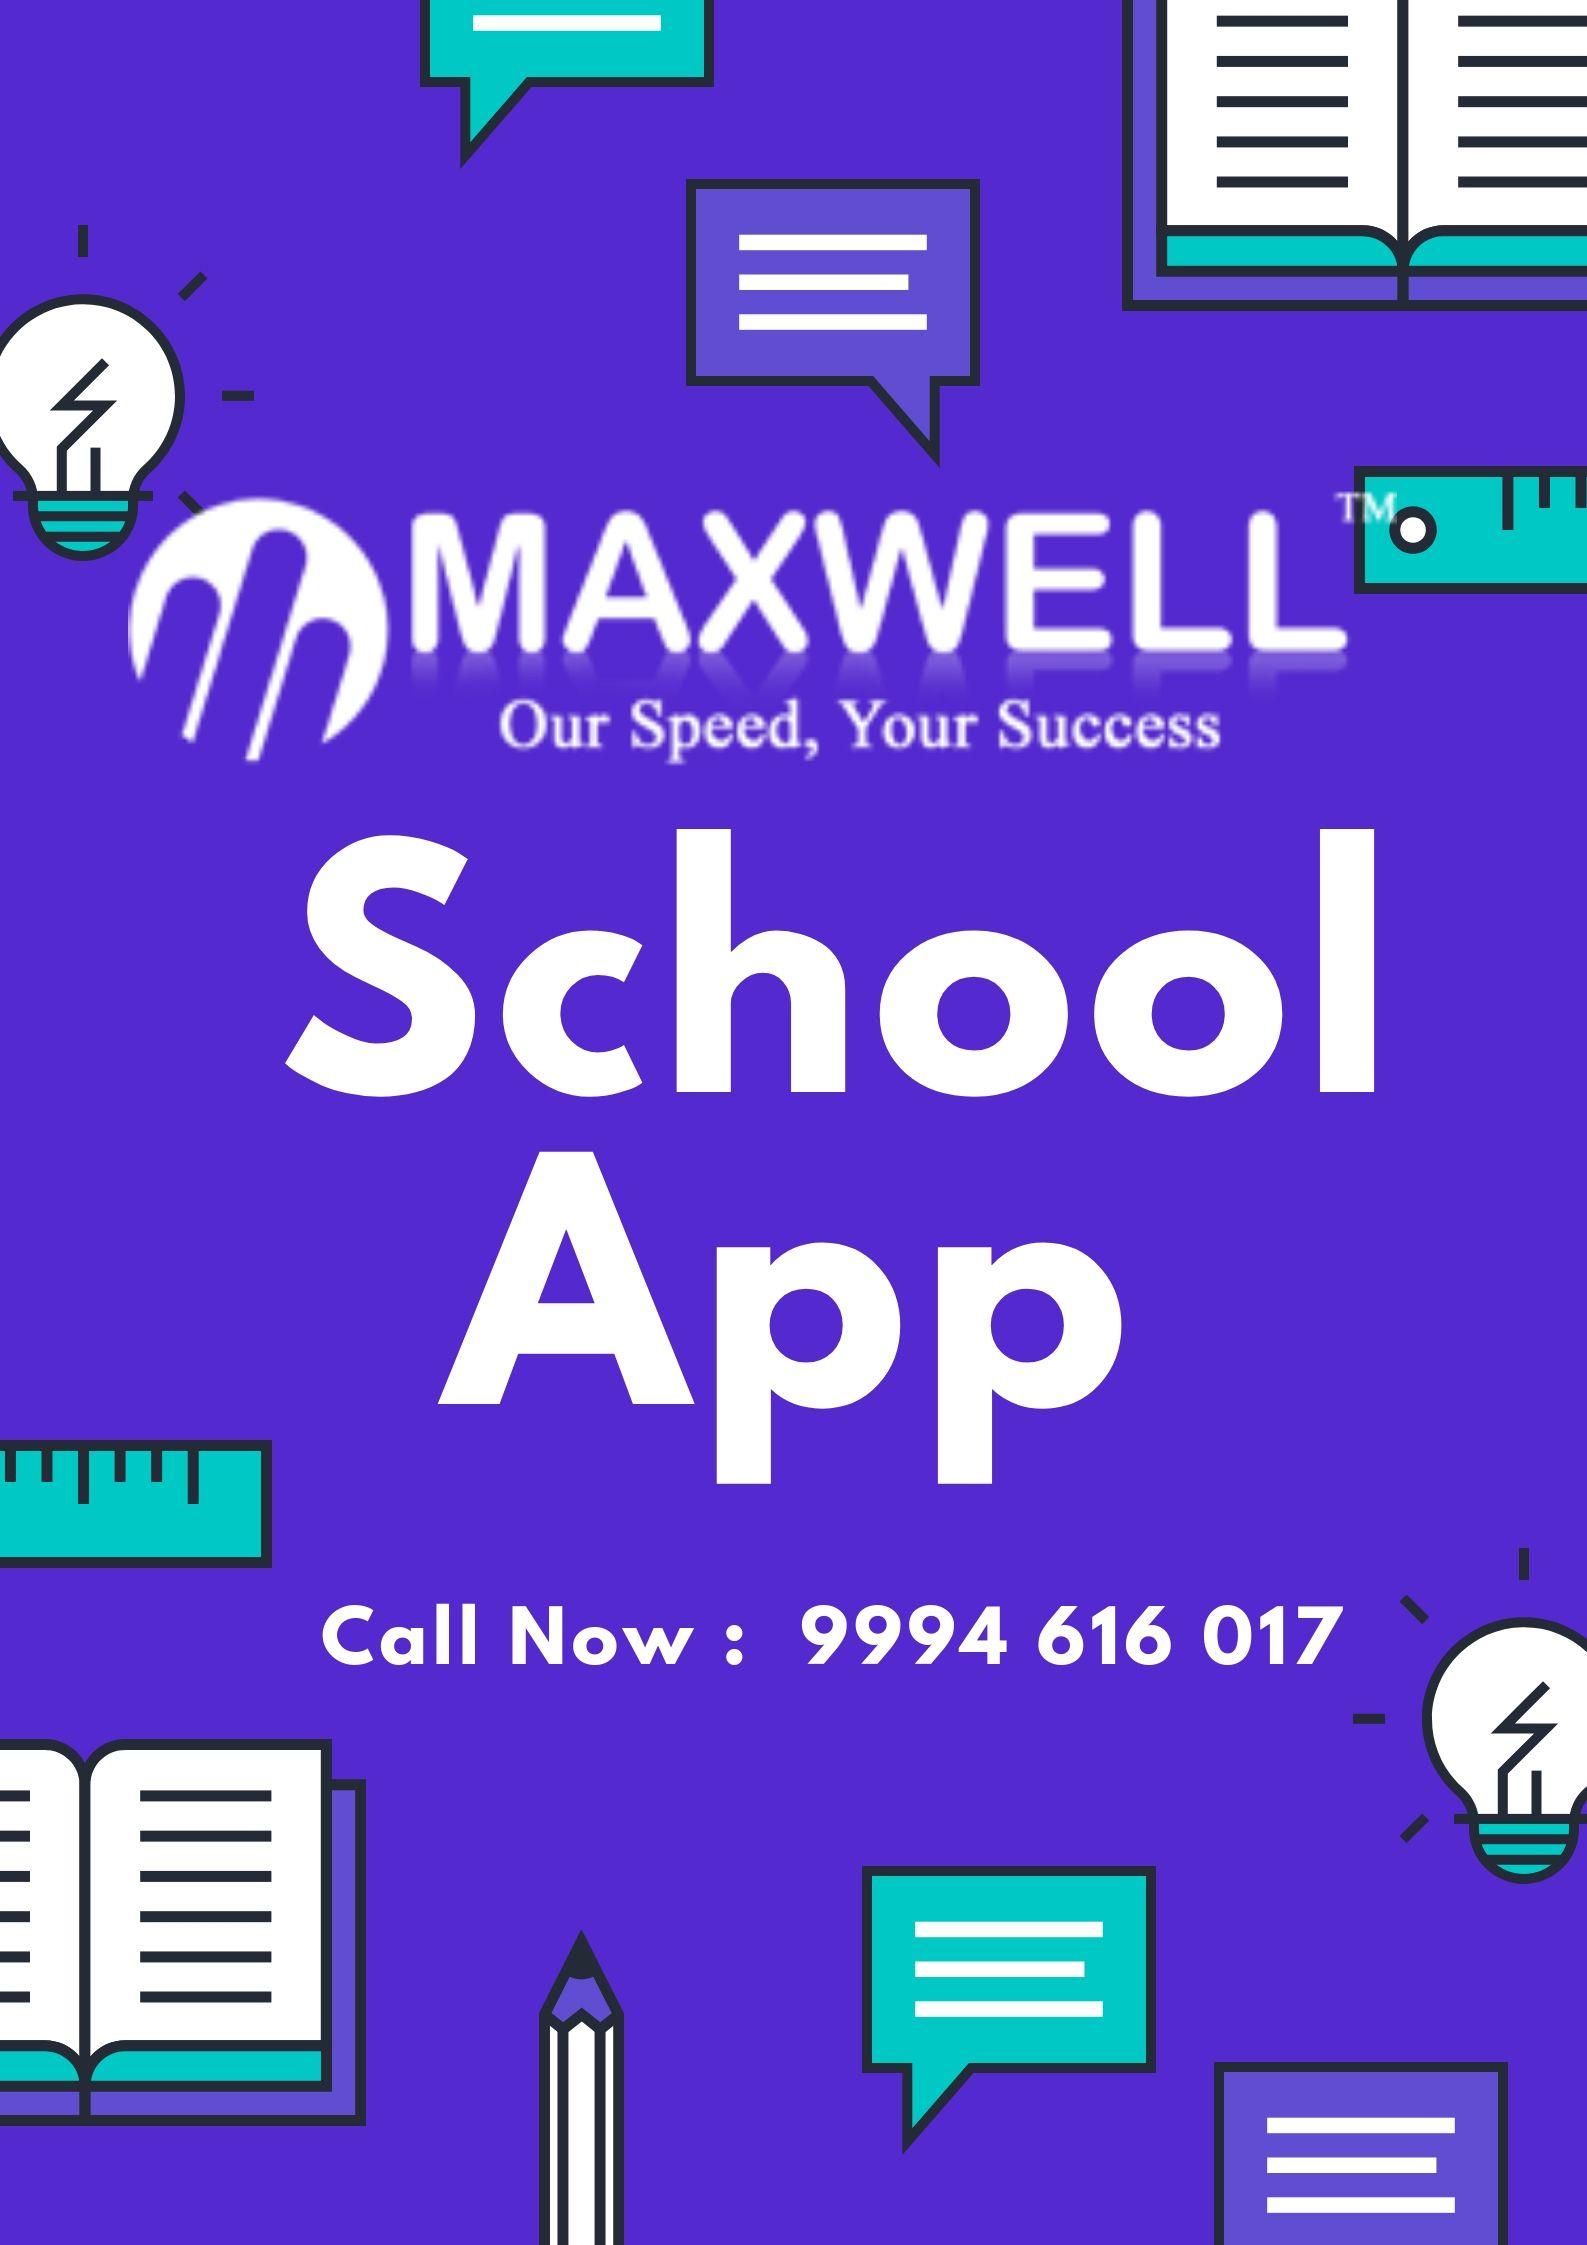 MAXWELLSchoolApp is a revolutionary Mobile / tablet